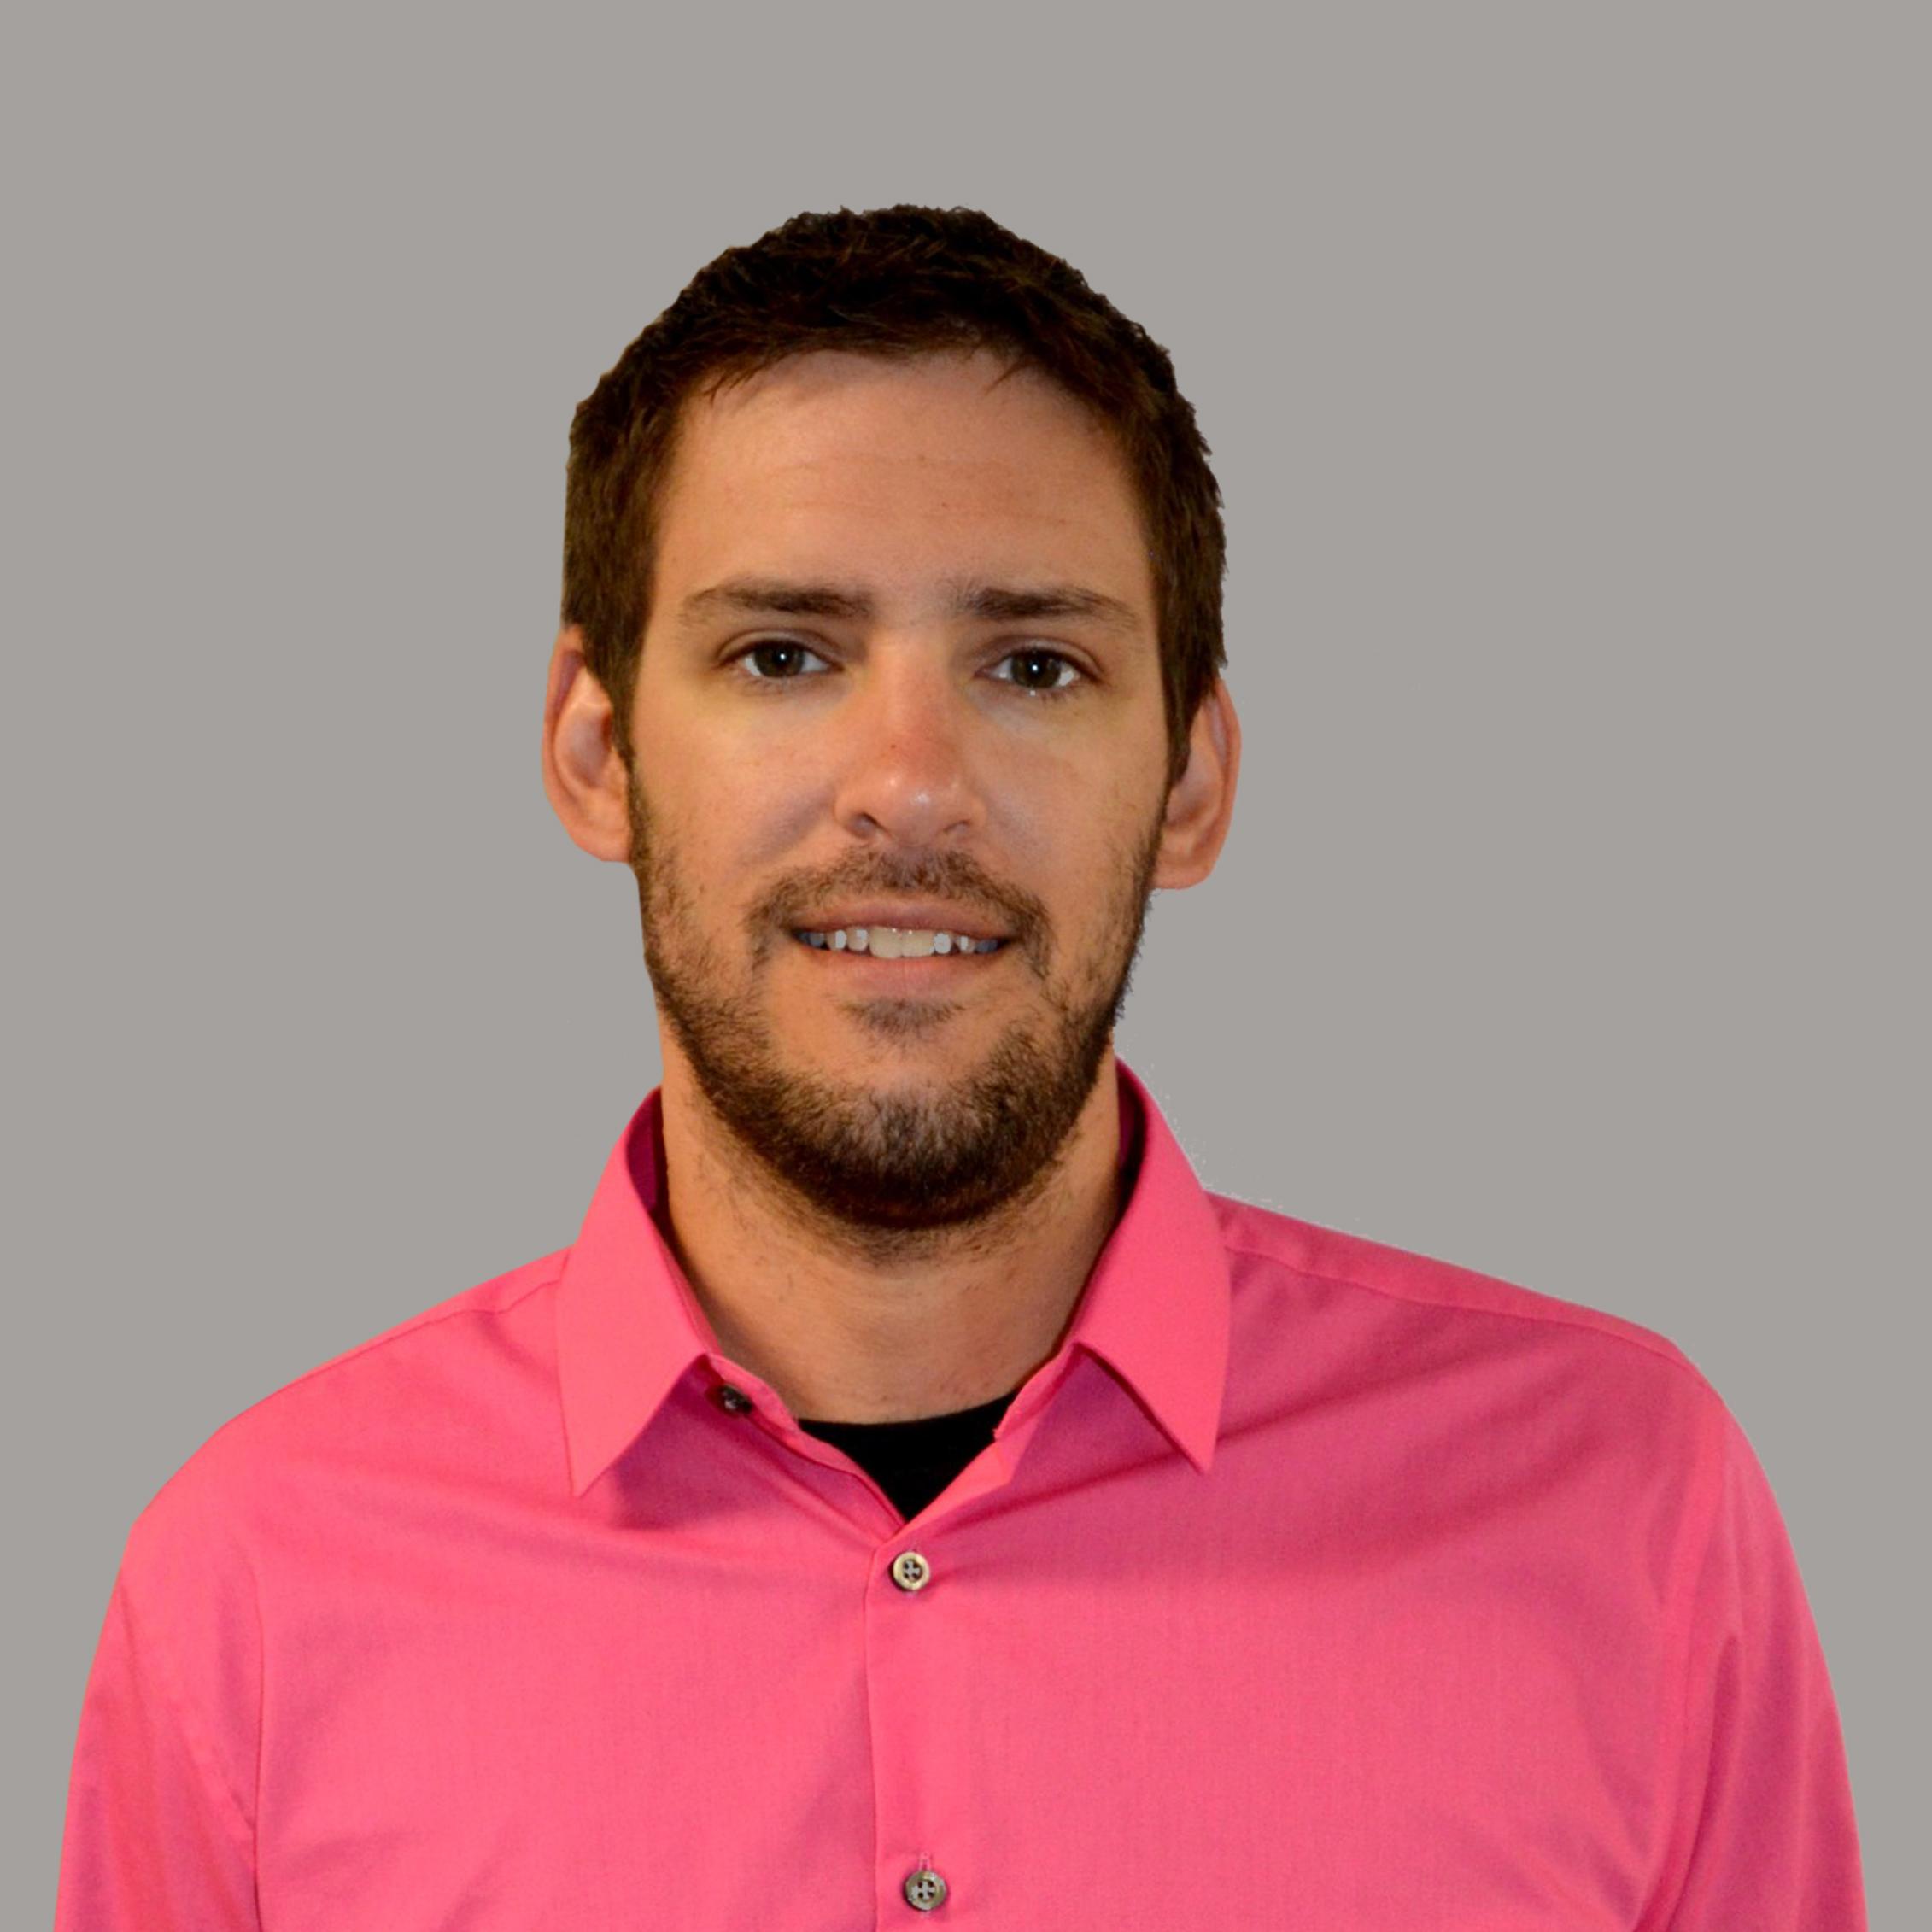 Kevin Hardsock - Assistant Vice President